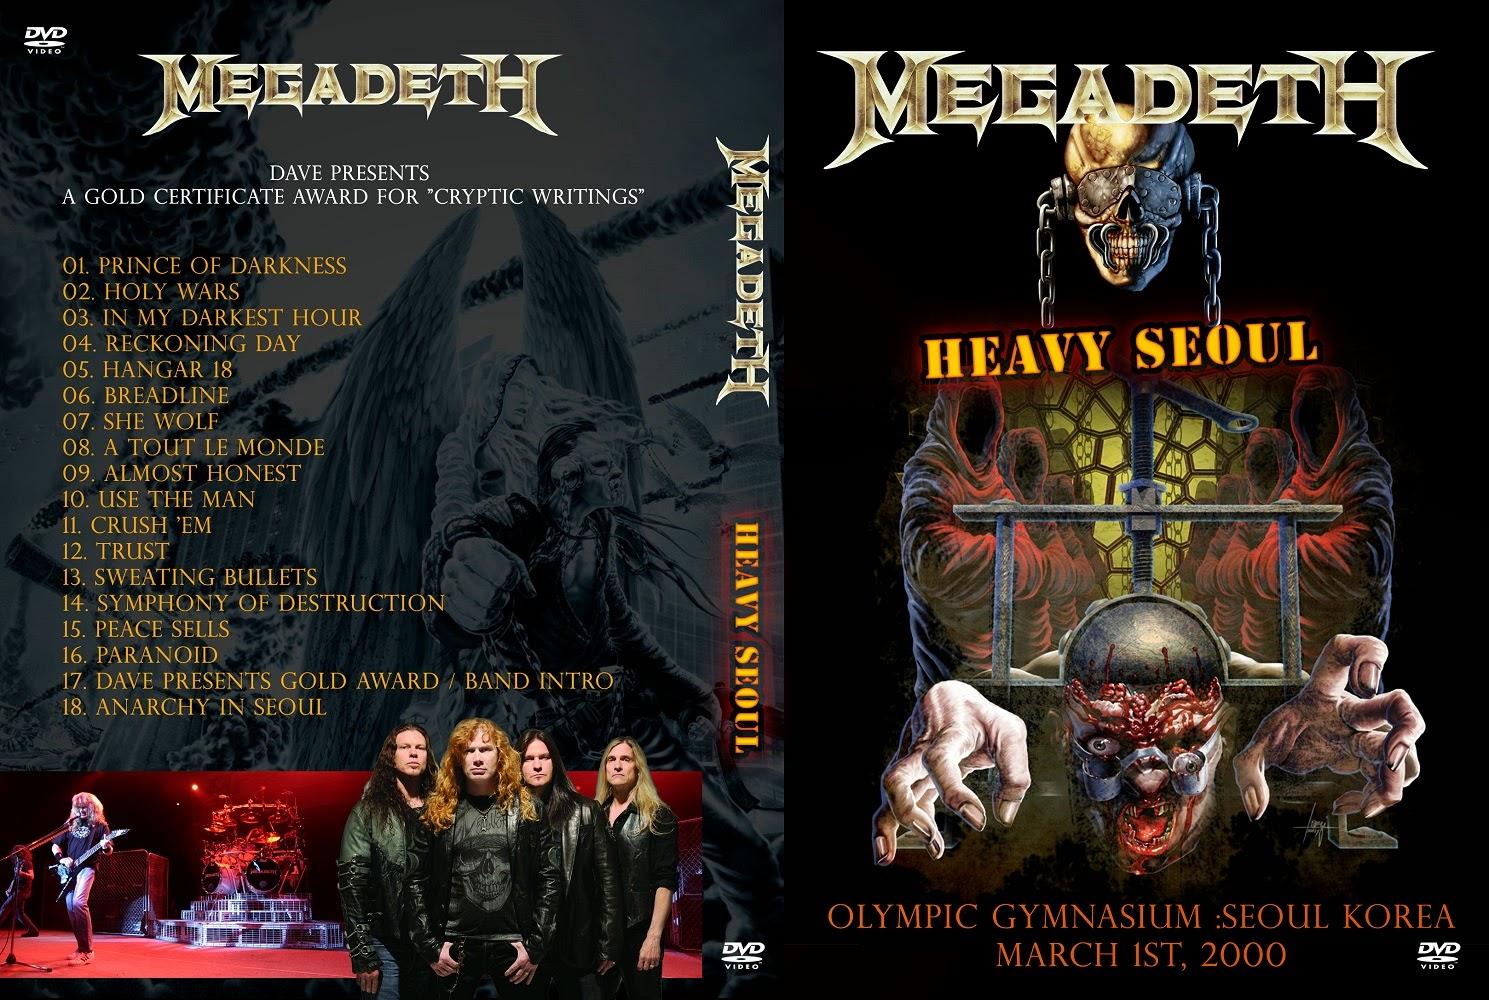 Megadeth Almost Honest (Broadcast Music Video) (Explicit)